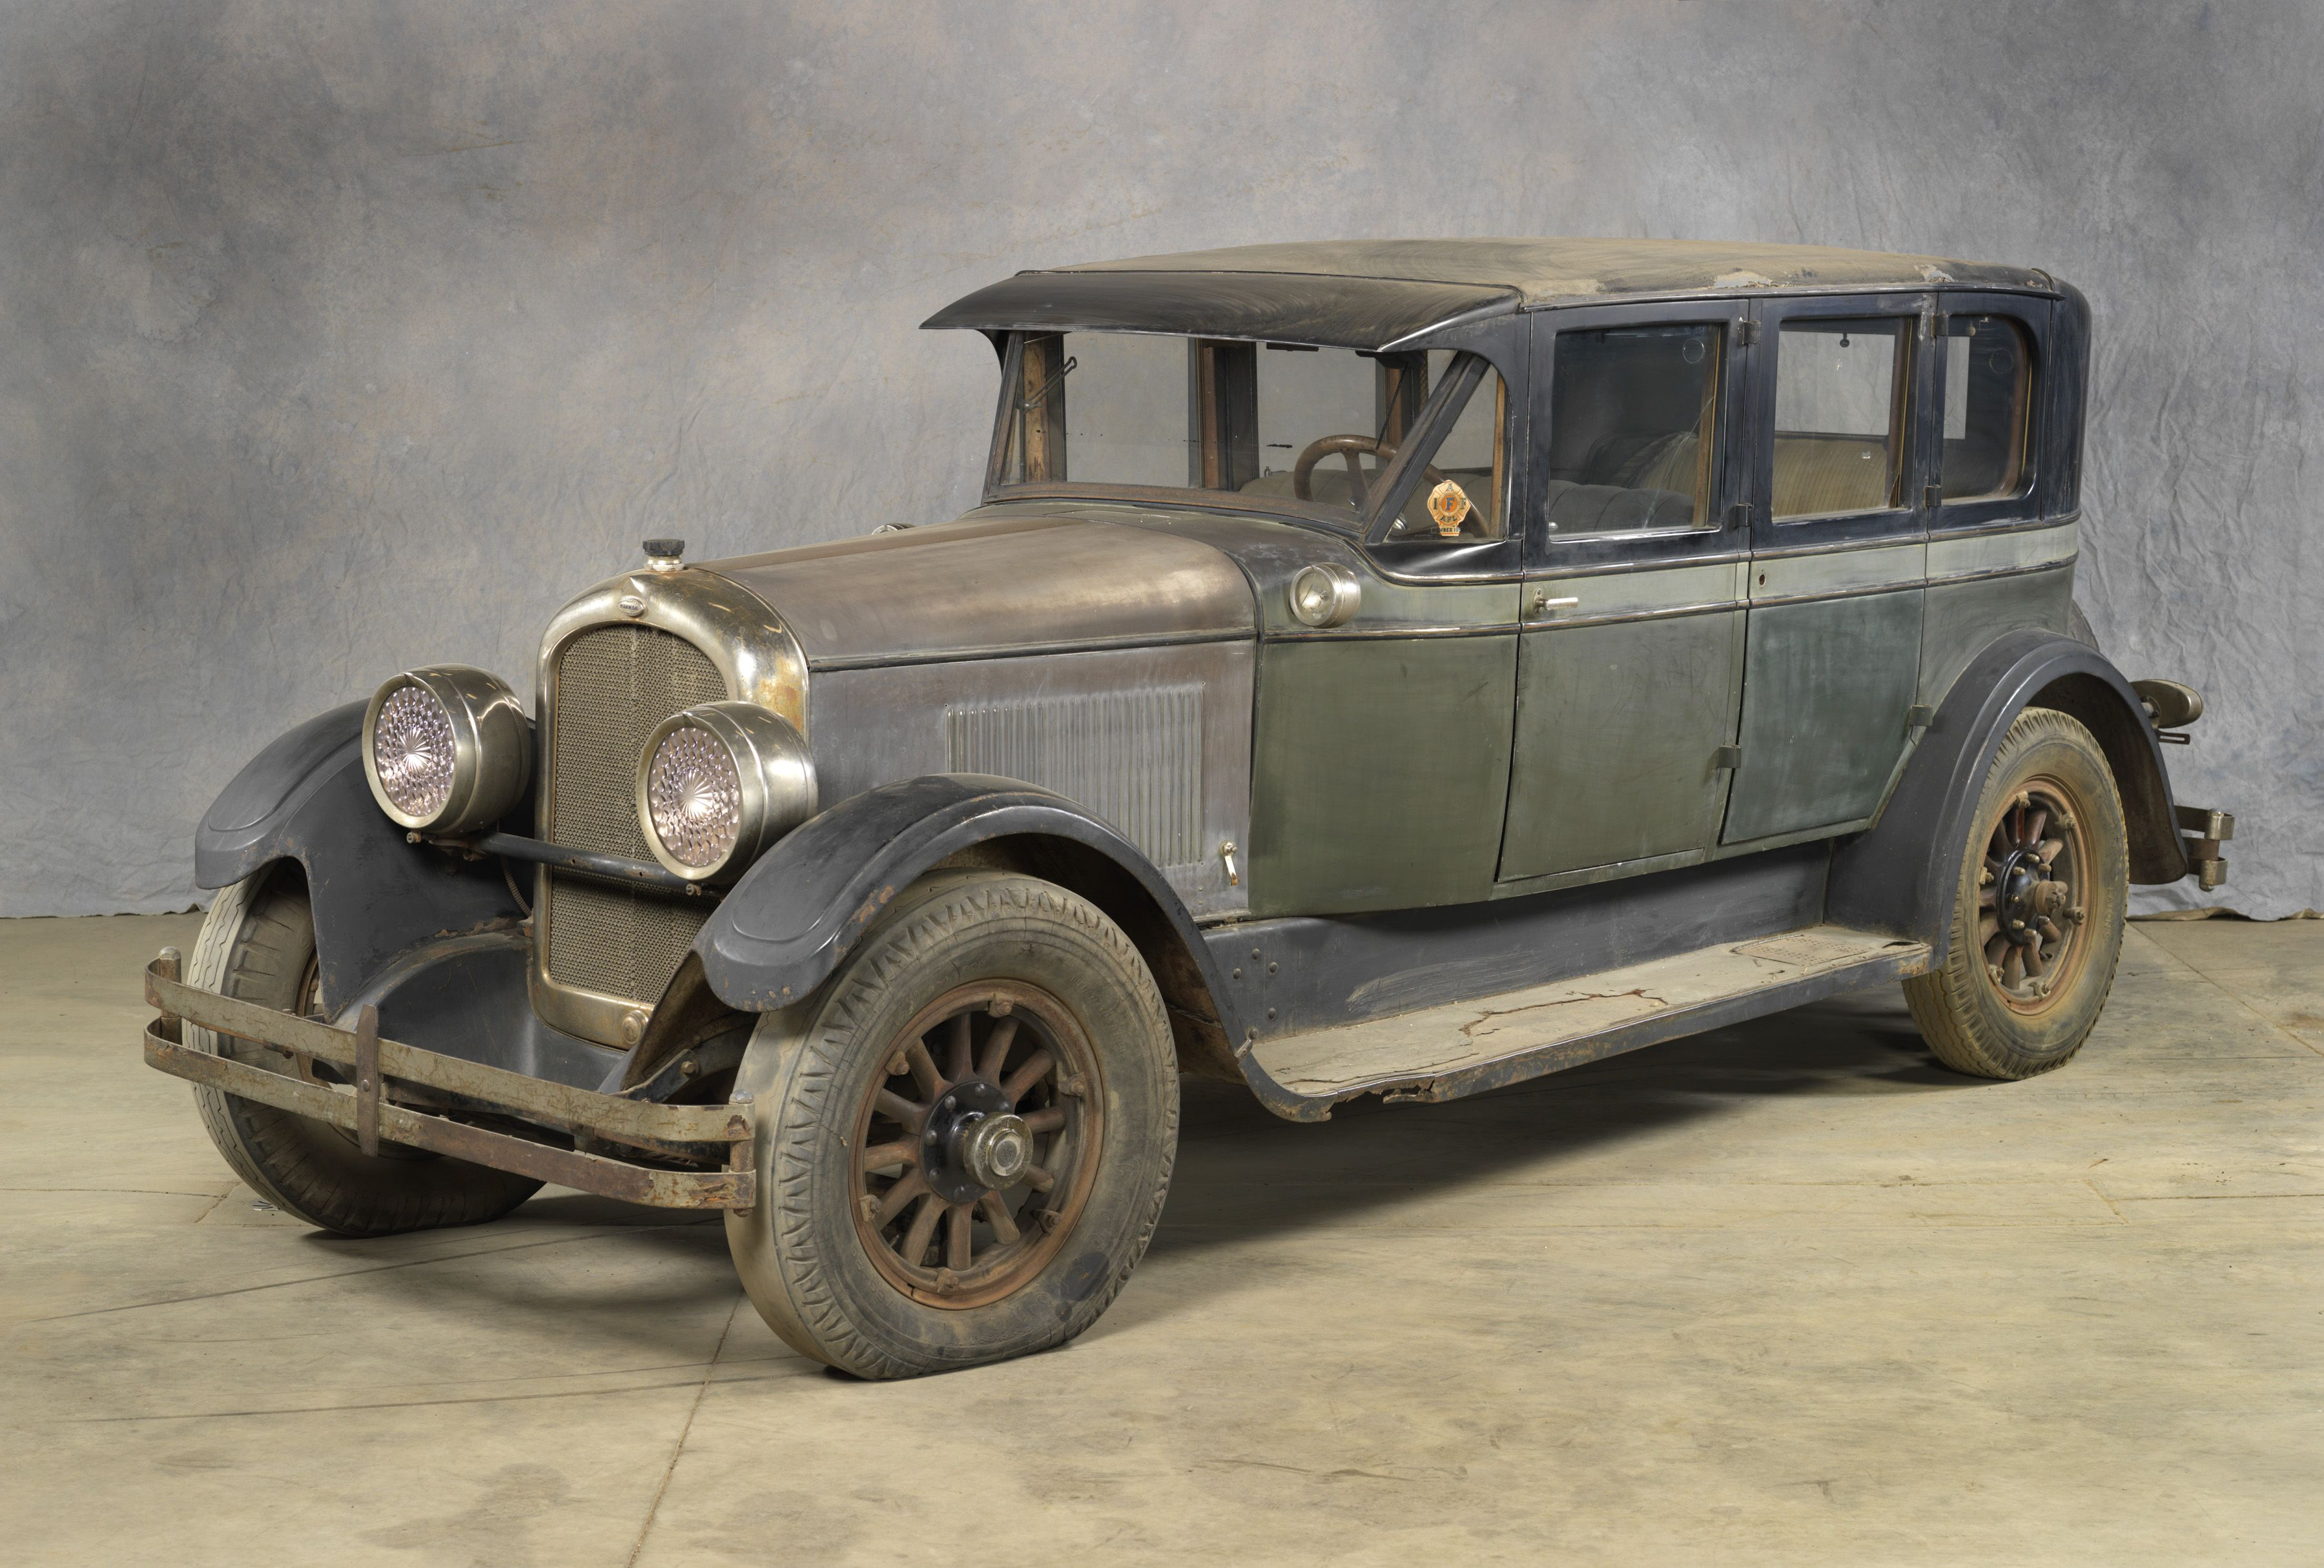 1926 MARMON MODEL 74 SEDAN: Howard & Walter Marmon formed the Marmon ...